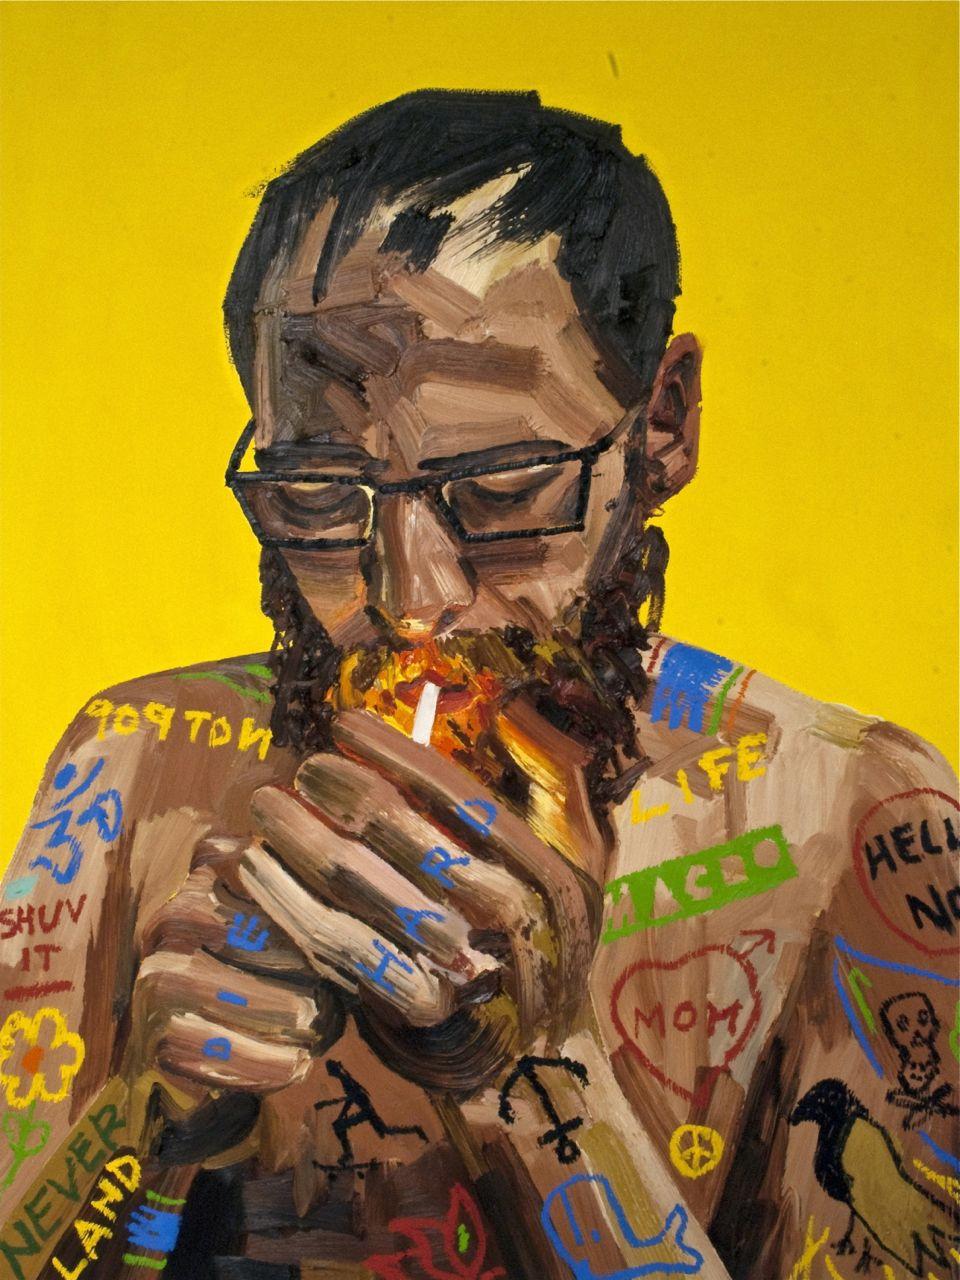 The GUEST ARTIST: ERIK OLSON